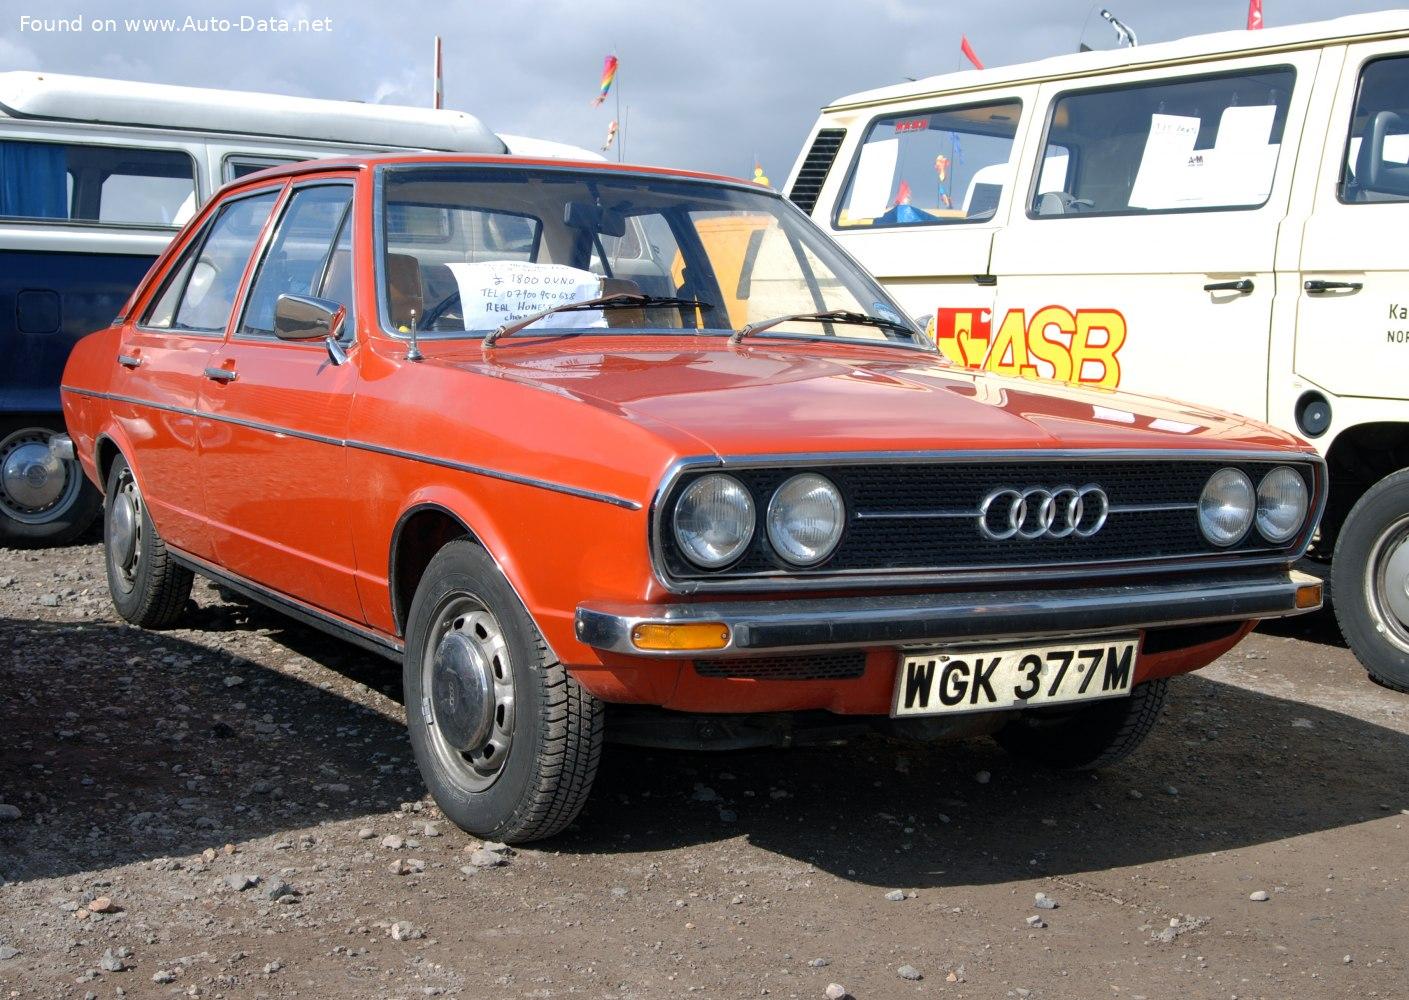 1972 Audi 80 (B1, Typ 80) 1.5 (75 кс) Automatic ...